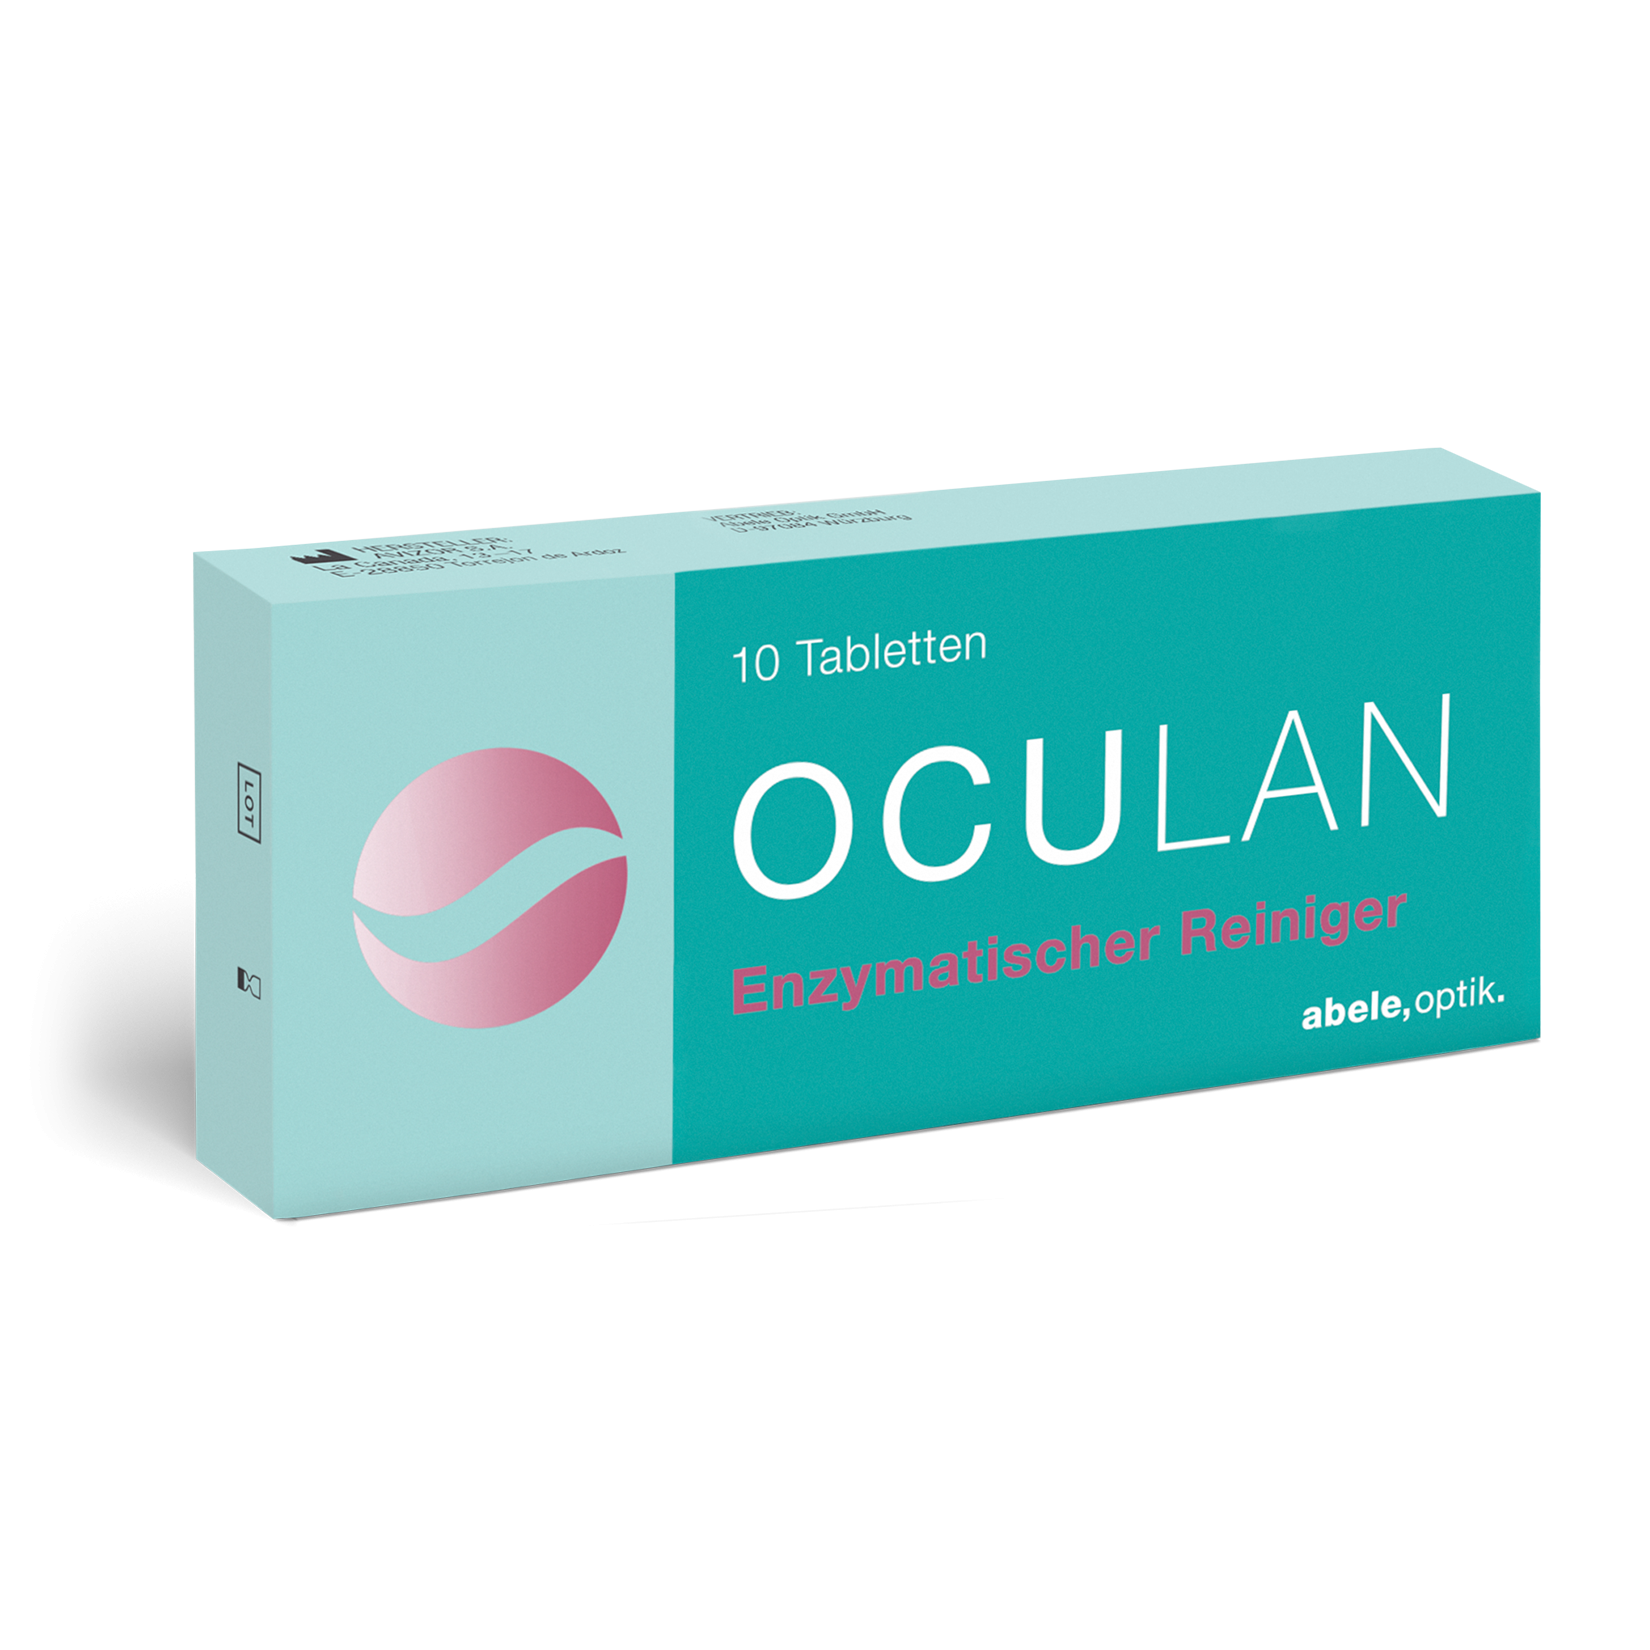 Oculan Enzymtabletten, Abele Optik (10 Tabl.)